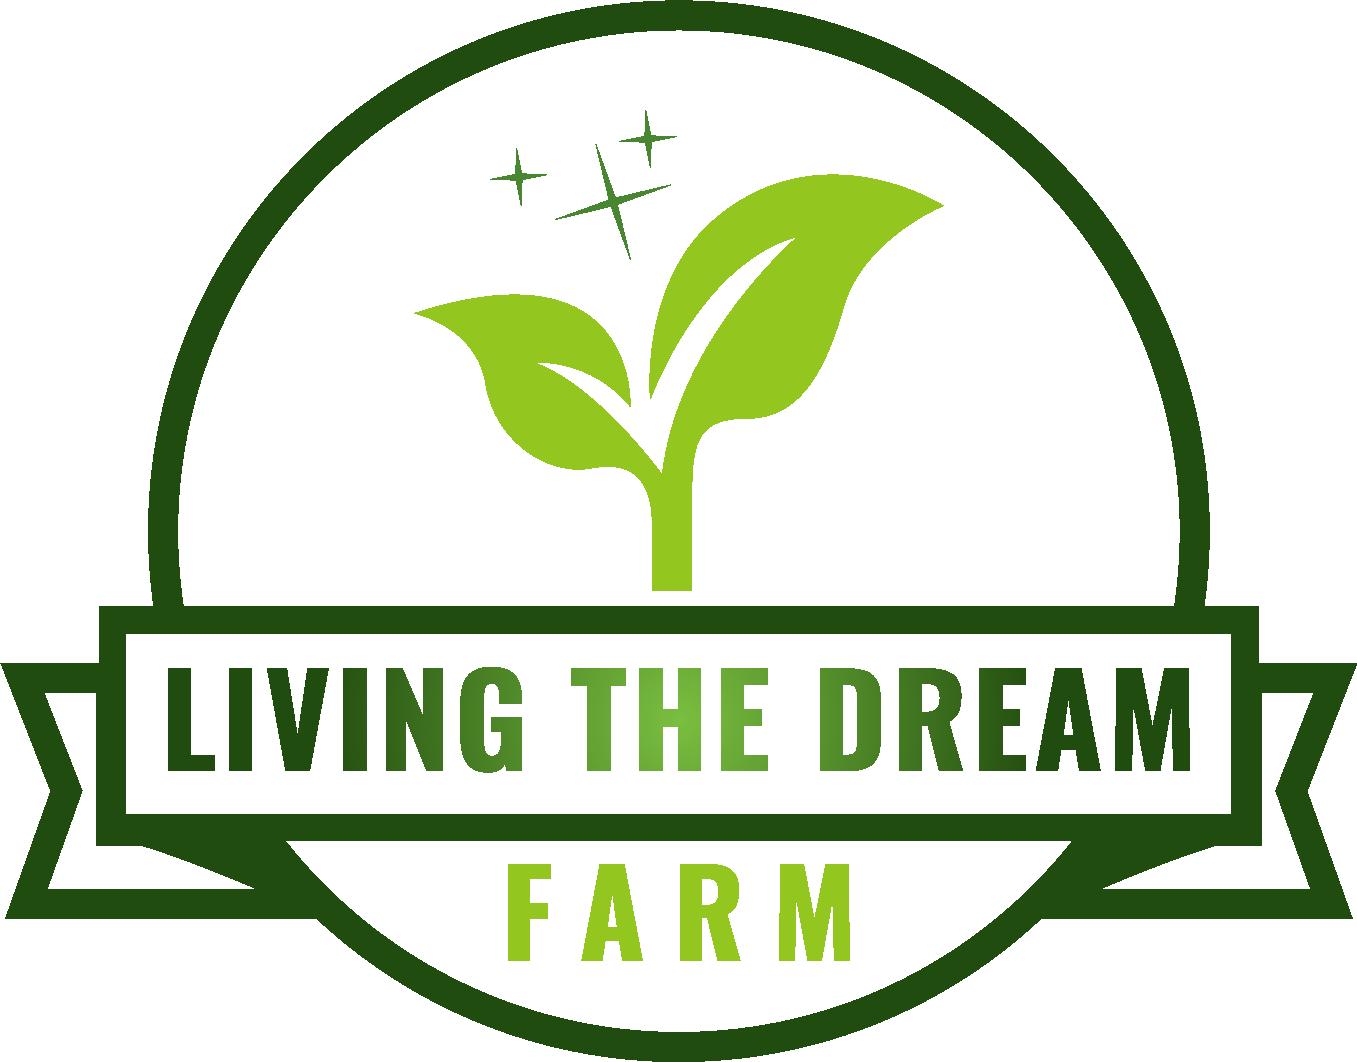 Living the Dream Farm, LLC image